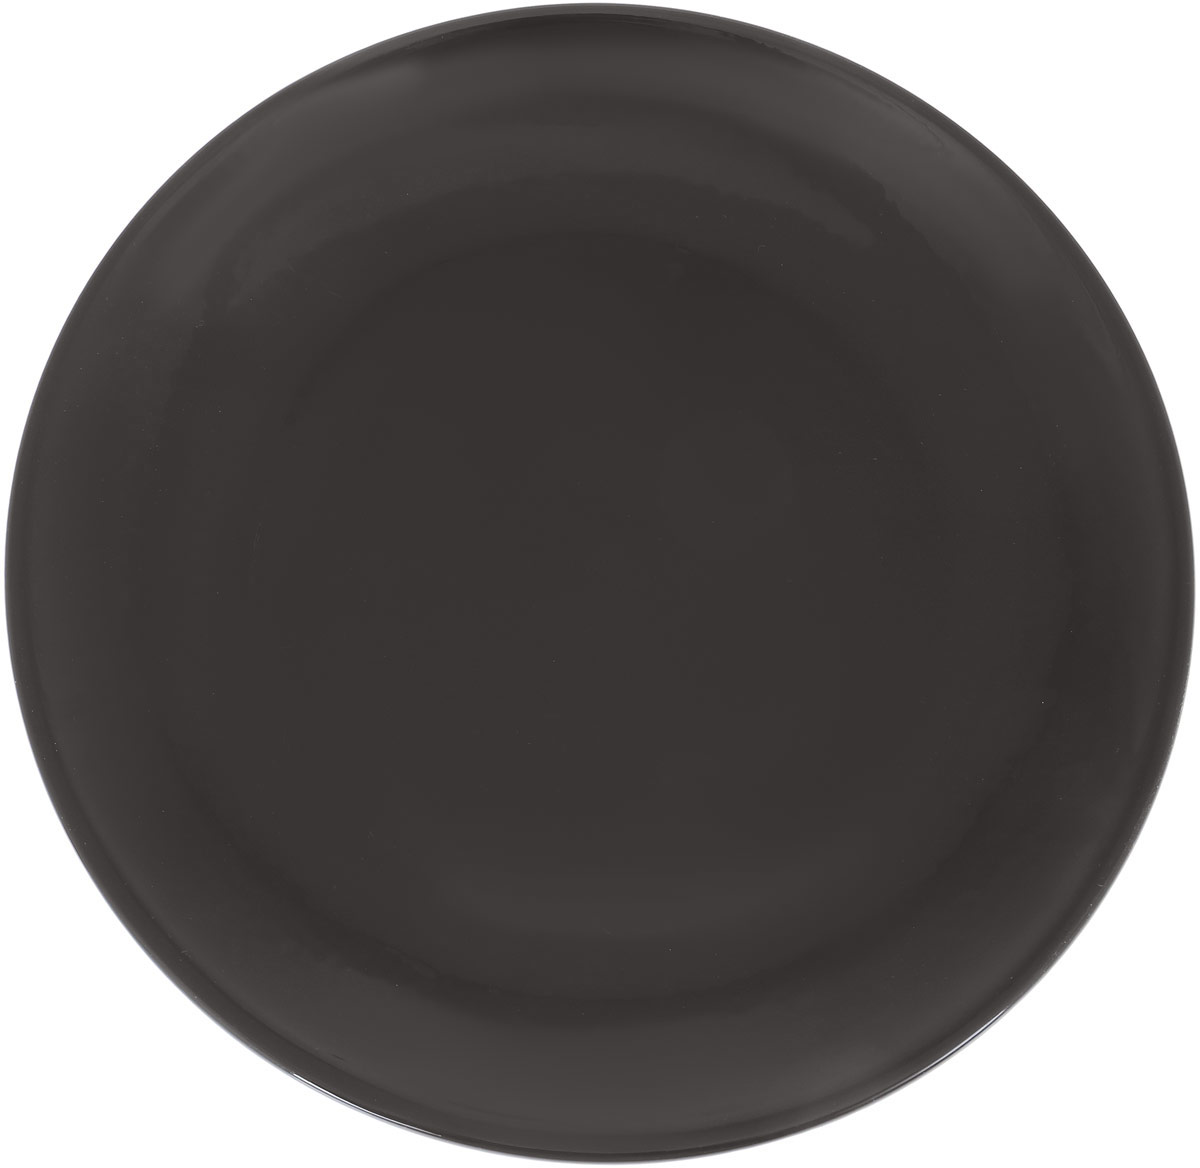 Тарелка Борисовская керамика СтаринаСТР14458049Тарелка плоская СТР14458049. Материал: Керамика. Объем: 0,25